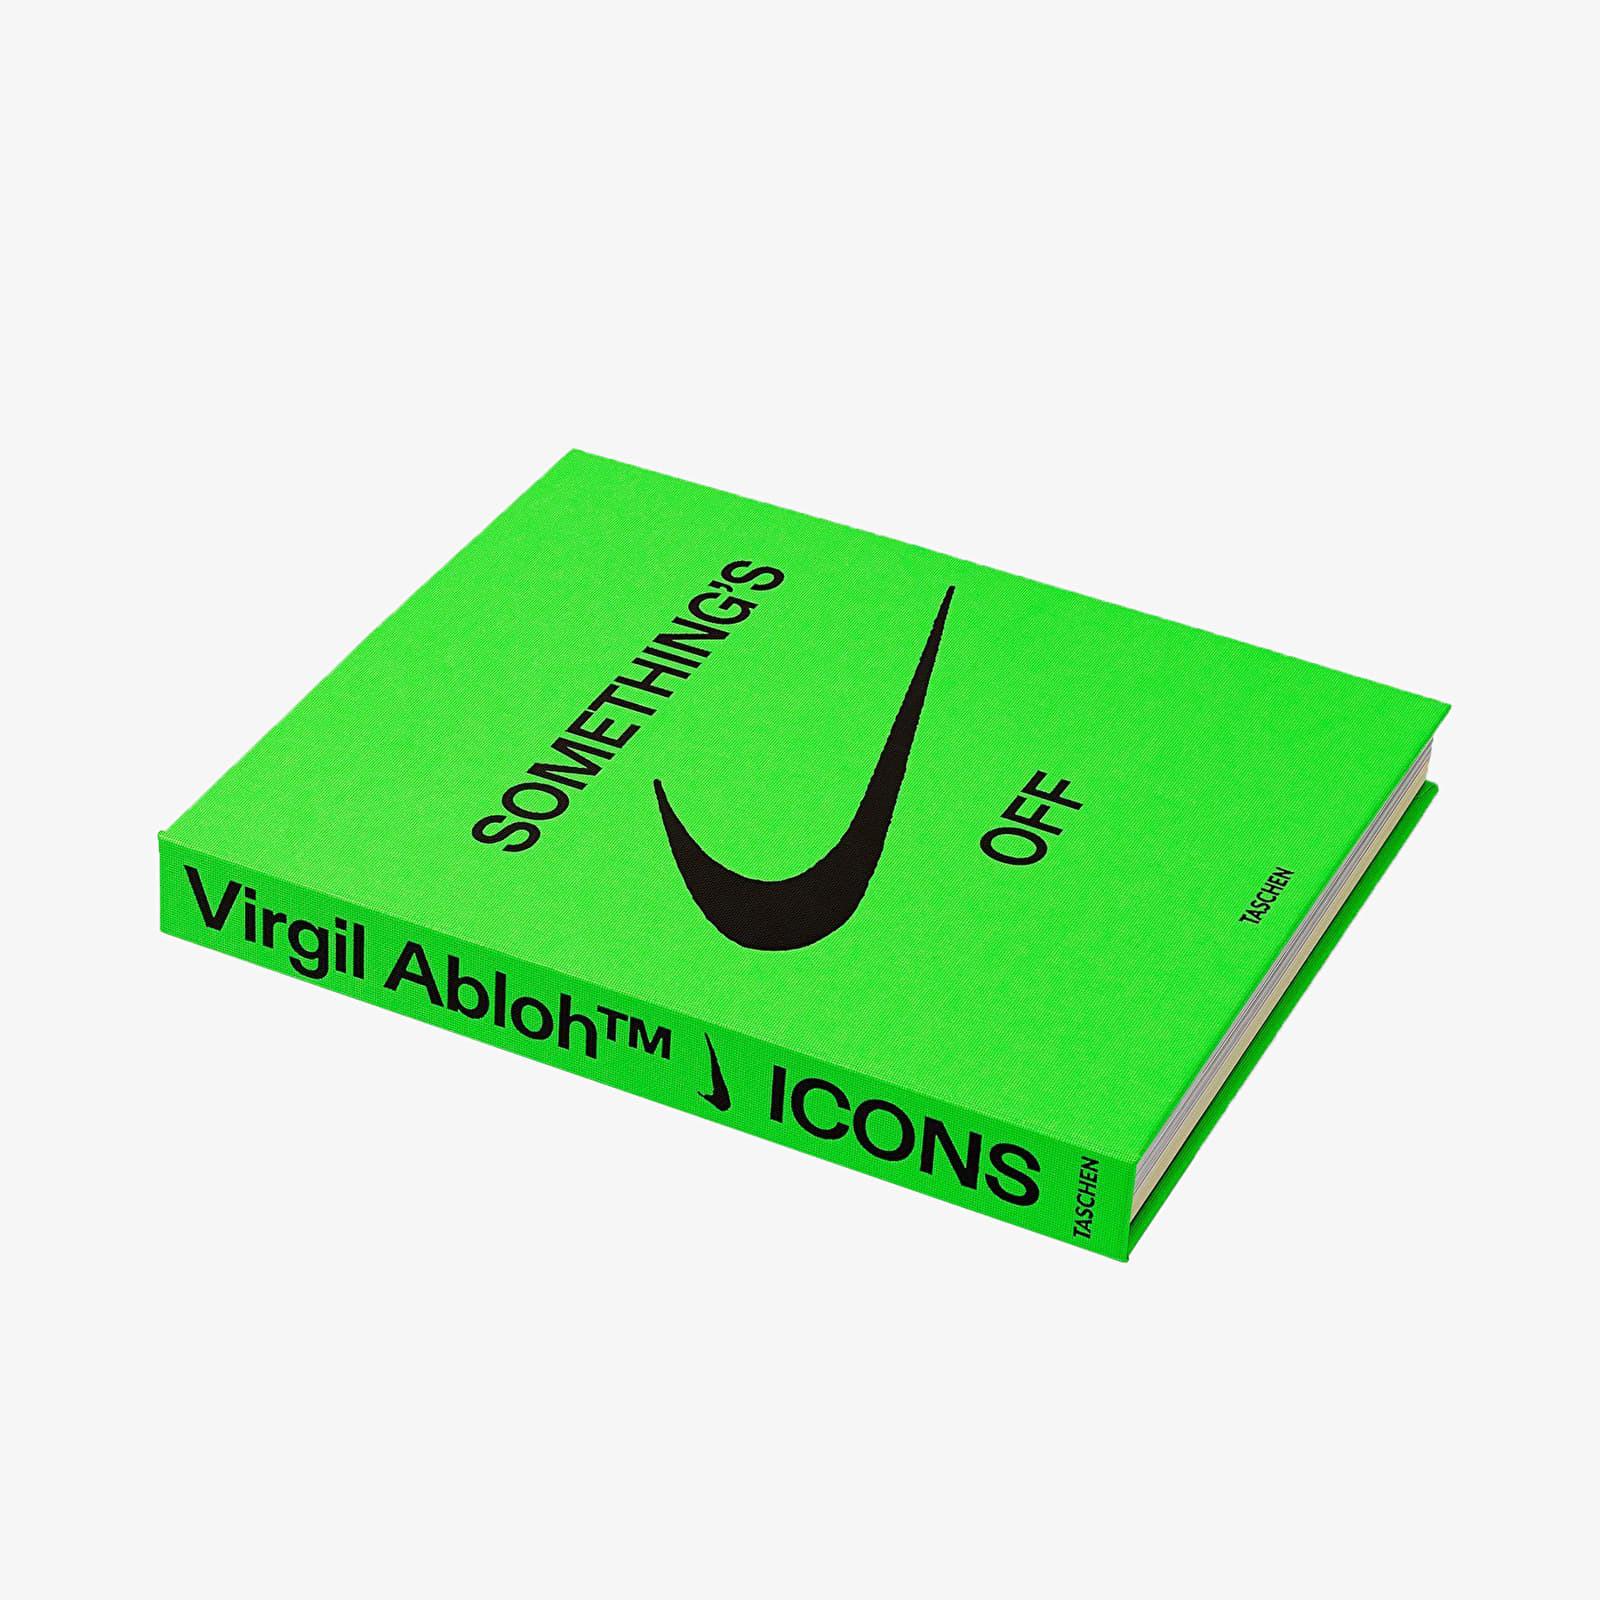 Virgil Abloh Nike Icons Something's Off Book Universal